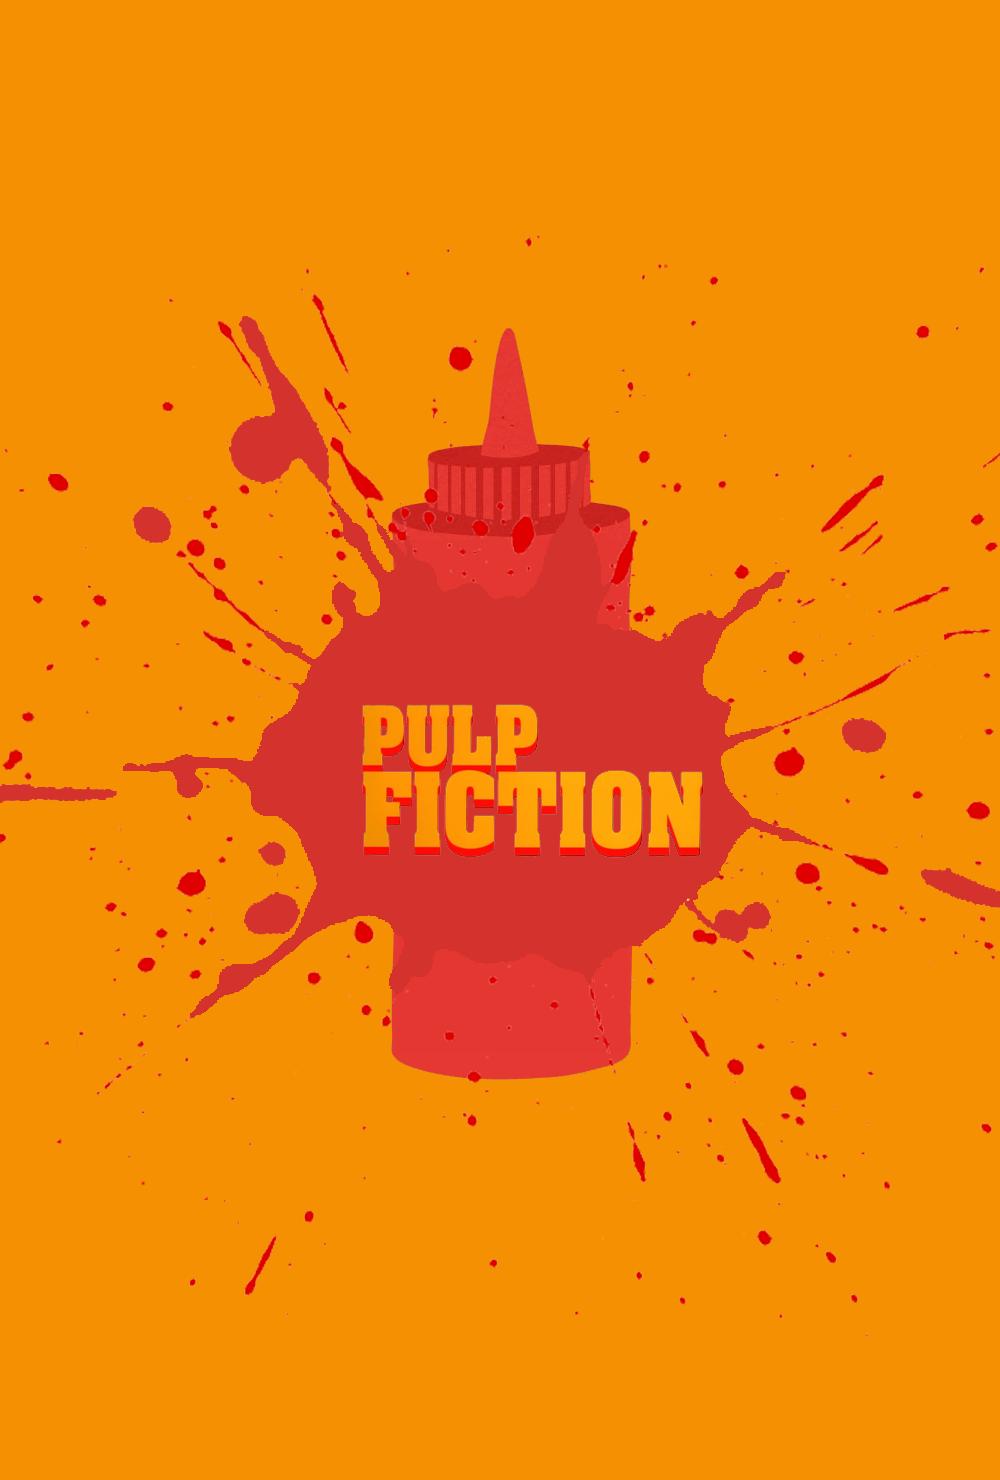 Pulp Fiction Minimalist Movie Poster By CarlitoJay On